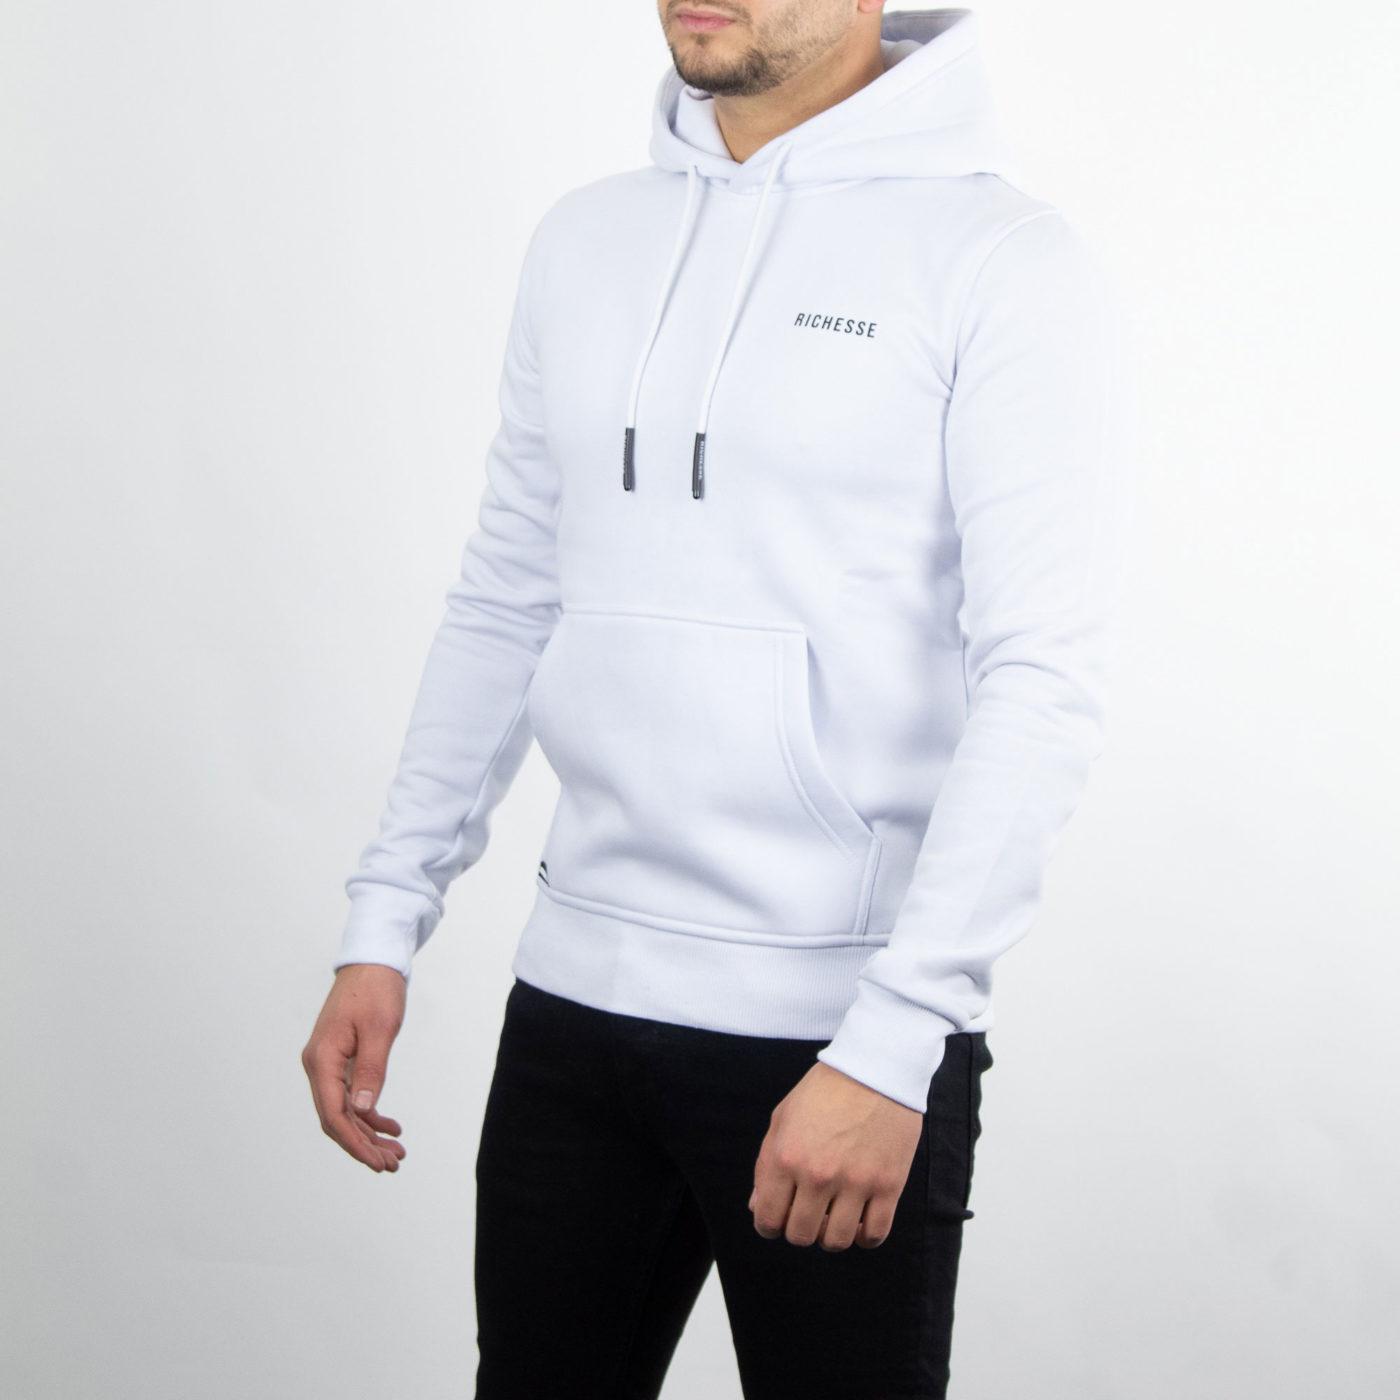 Richesse-Brand-Back-White-3